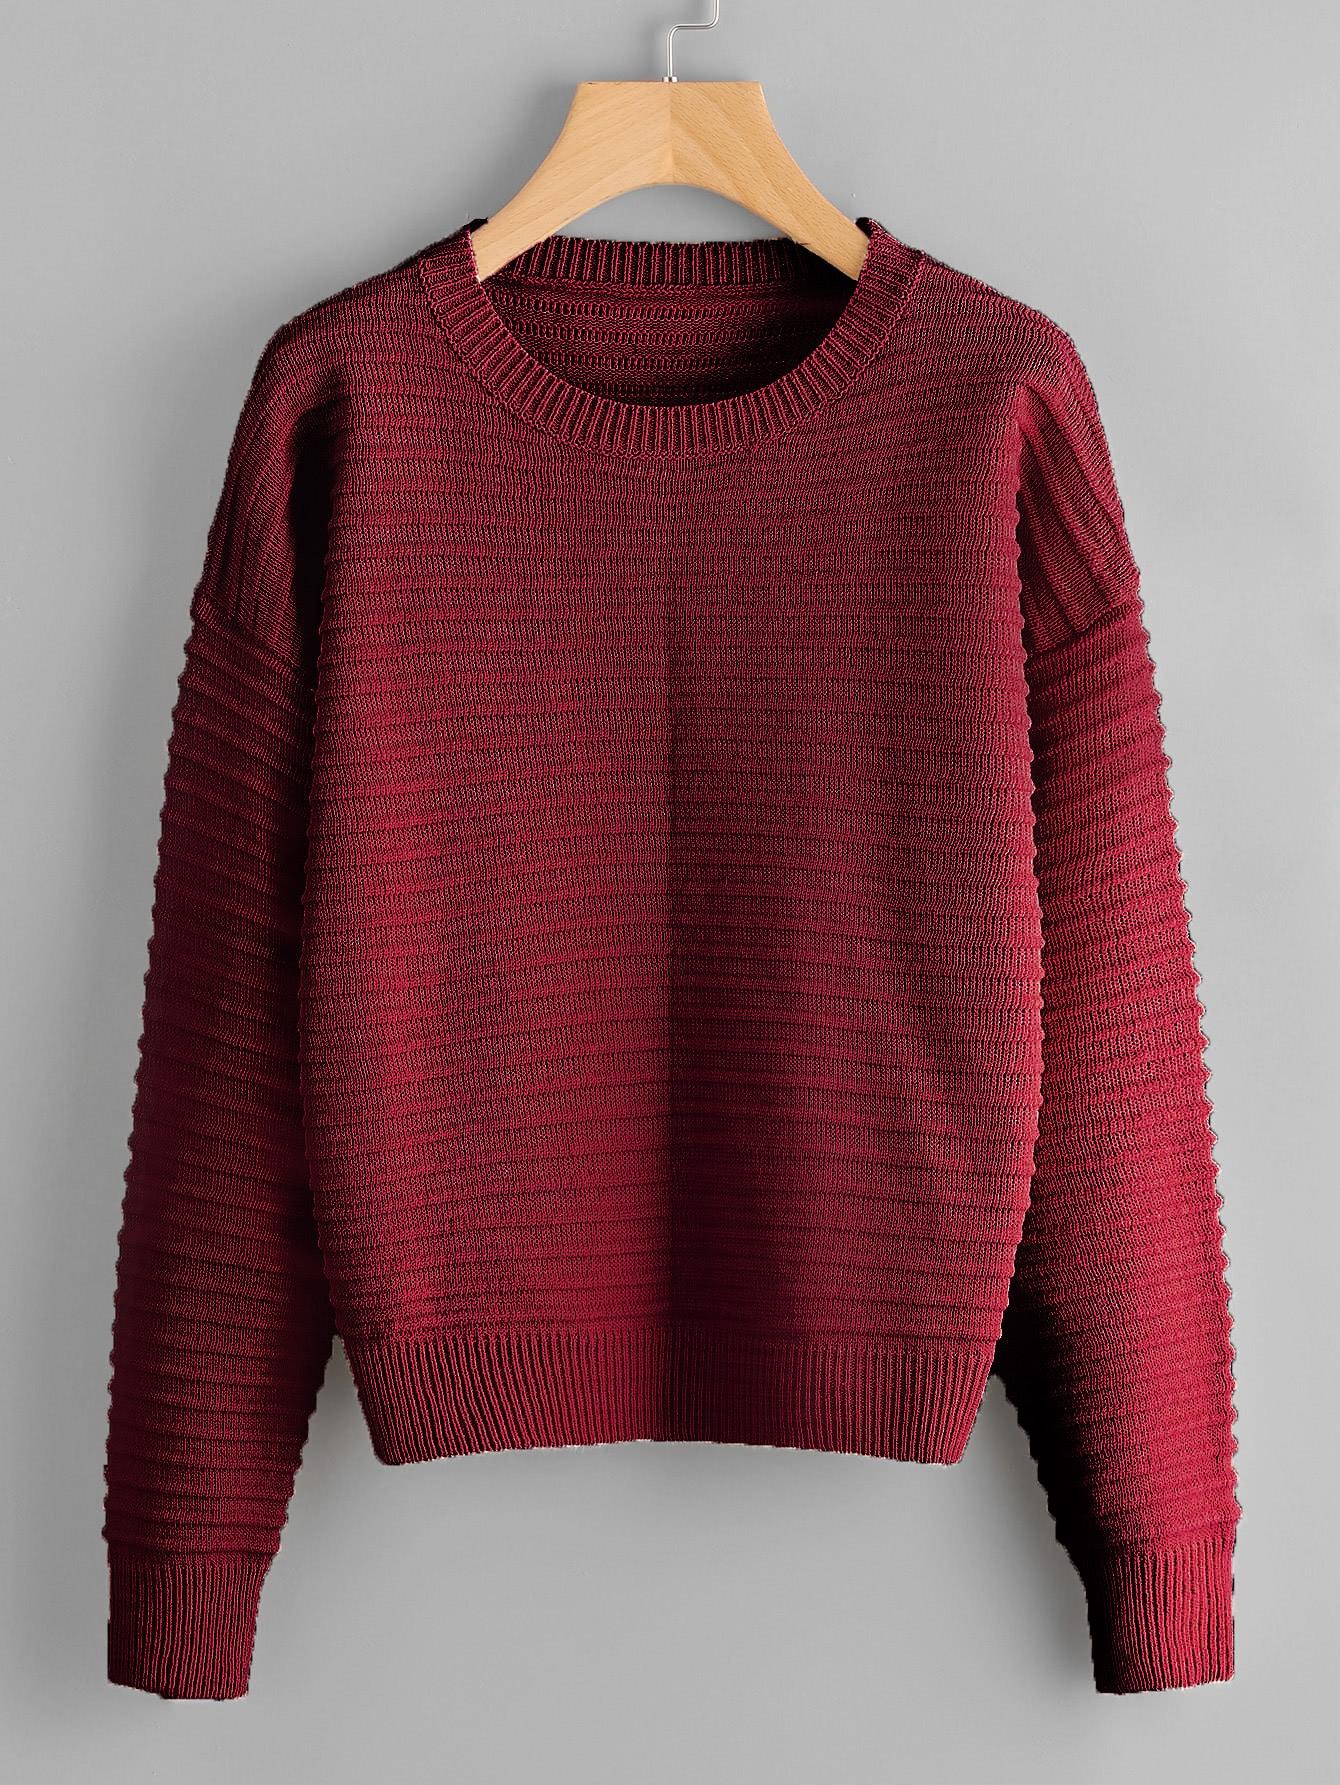 Drop Shoulder Rib Knit Sweater sweater170818451